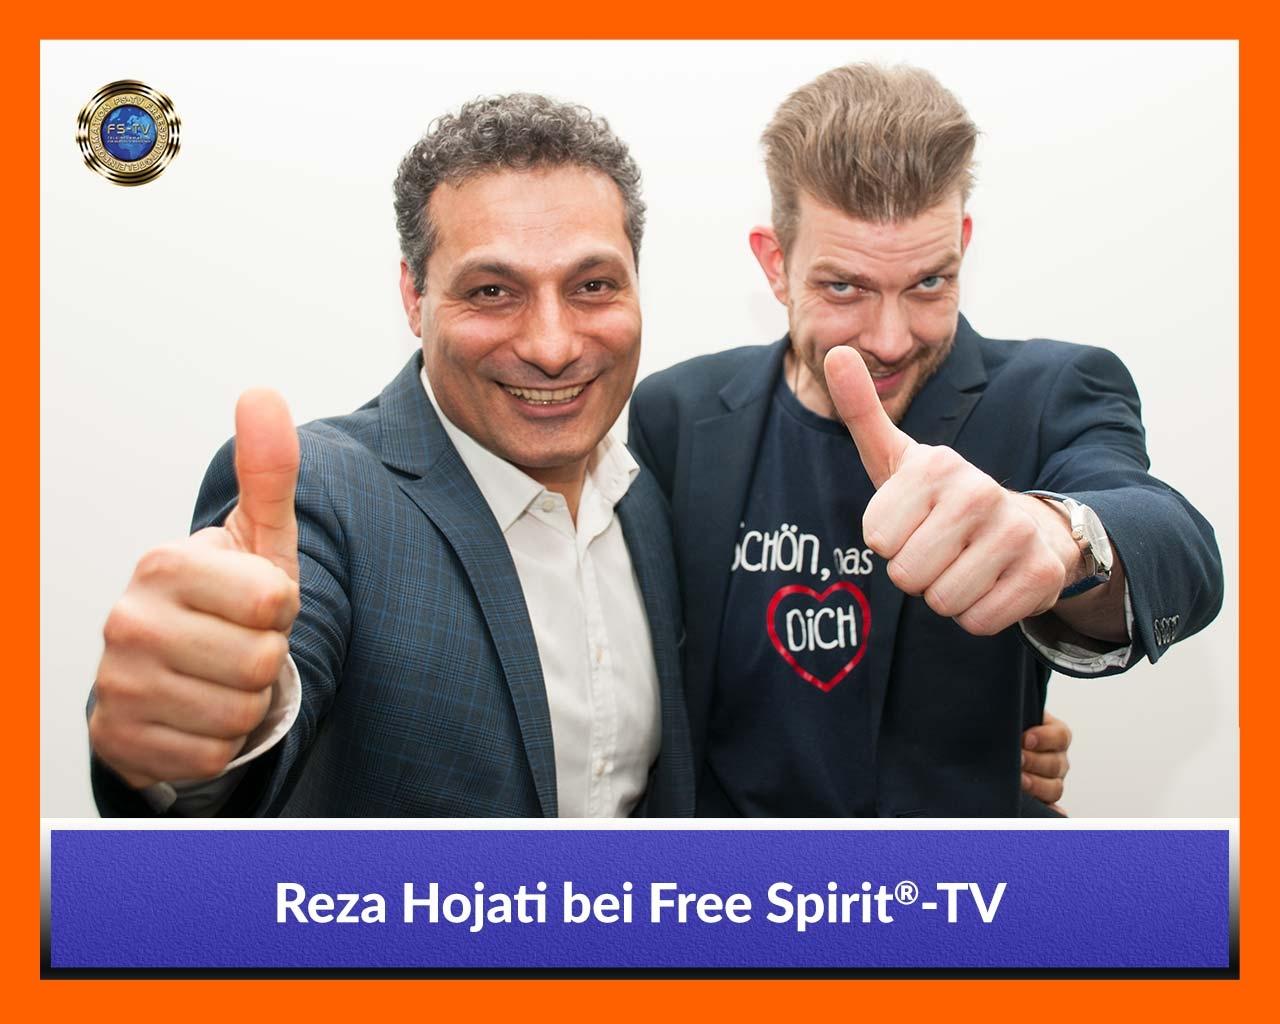 Reza-Hojati-04